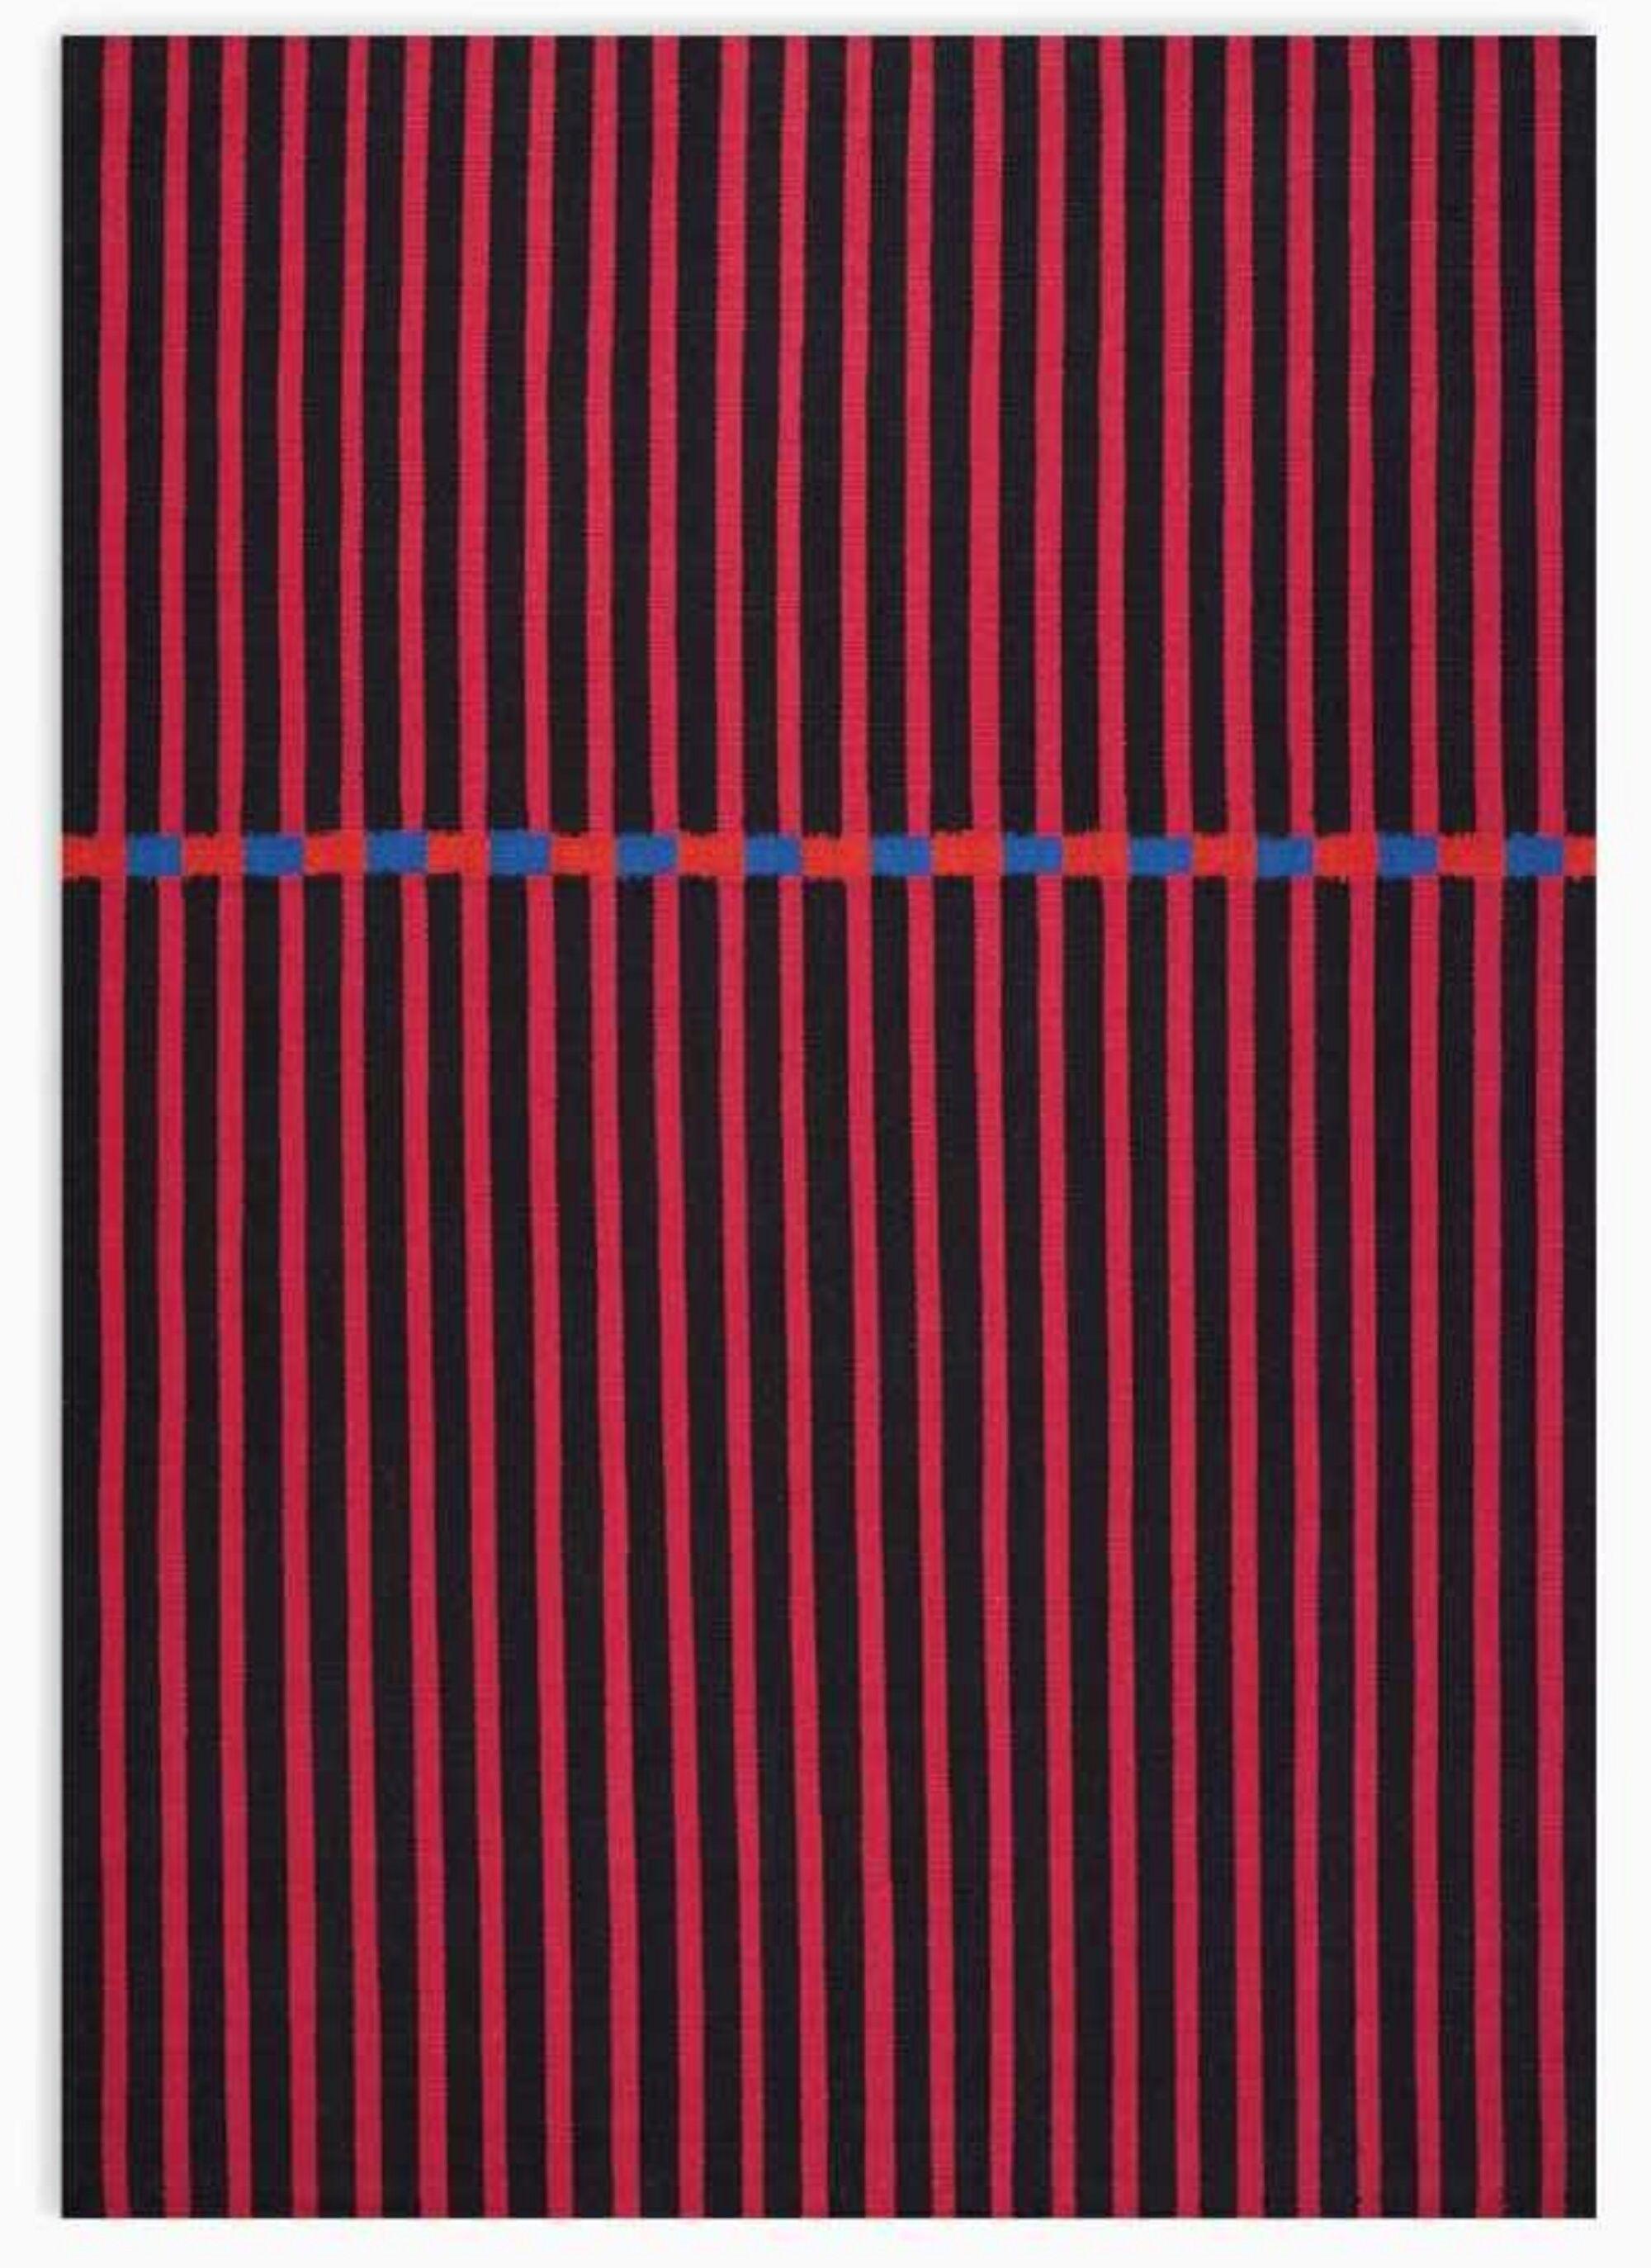 Nashville Modern Hand-Woven Magenta Area Rug Rug Size: Rectangle 8' x 10'